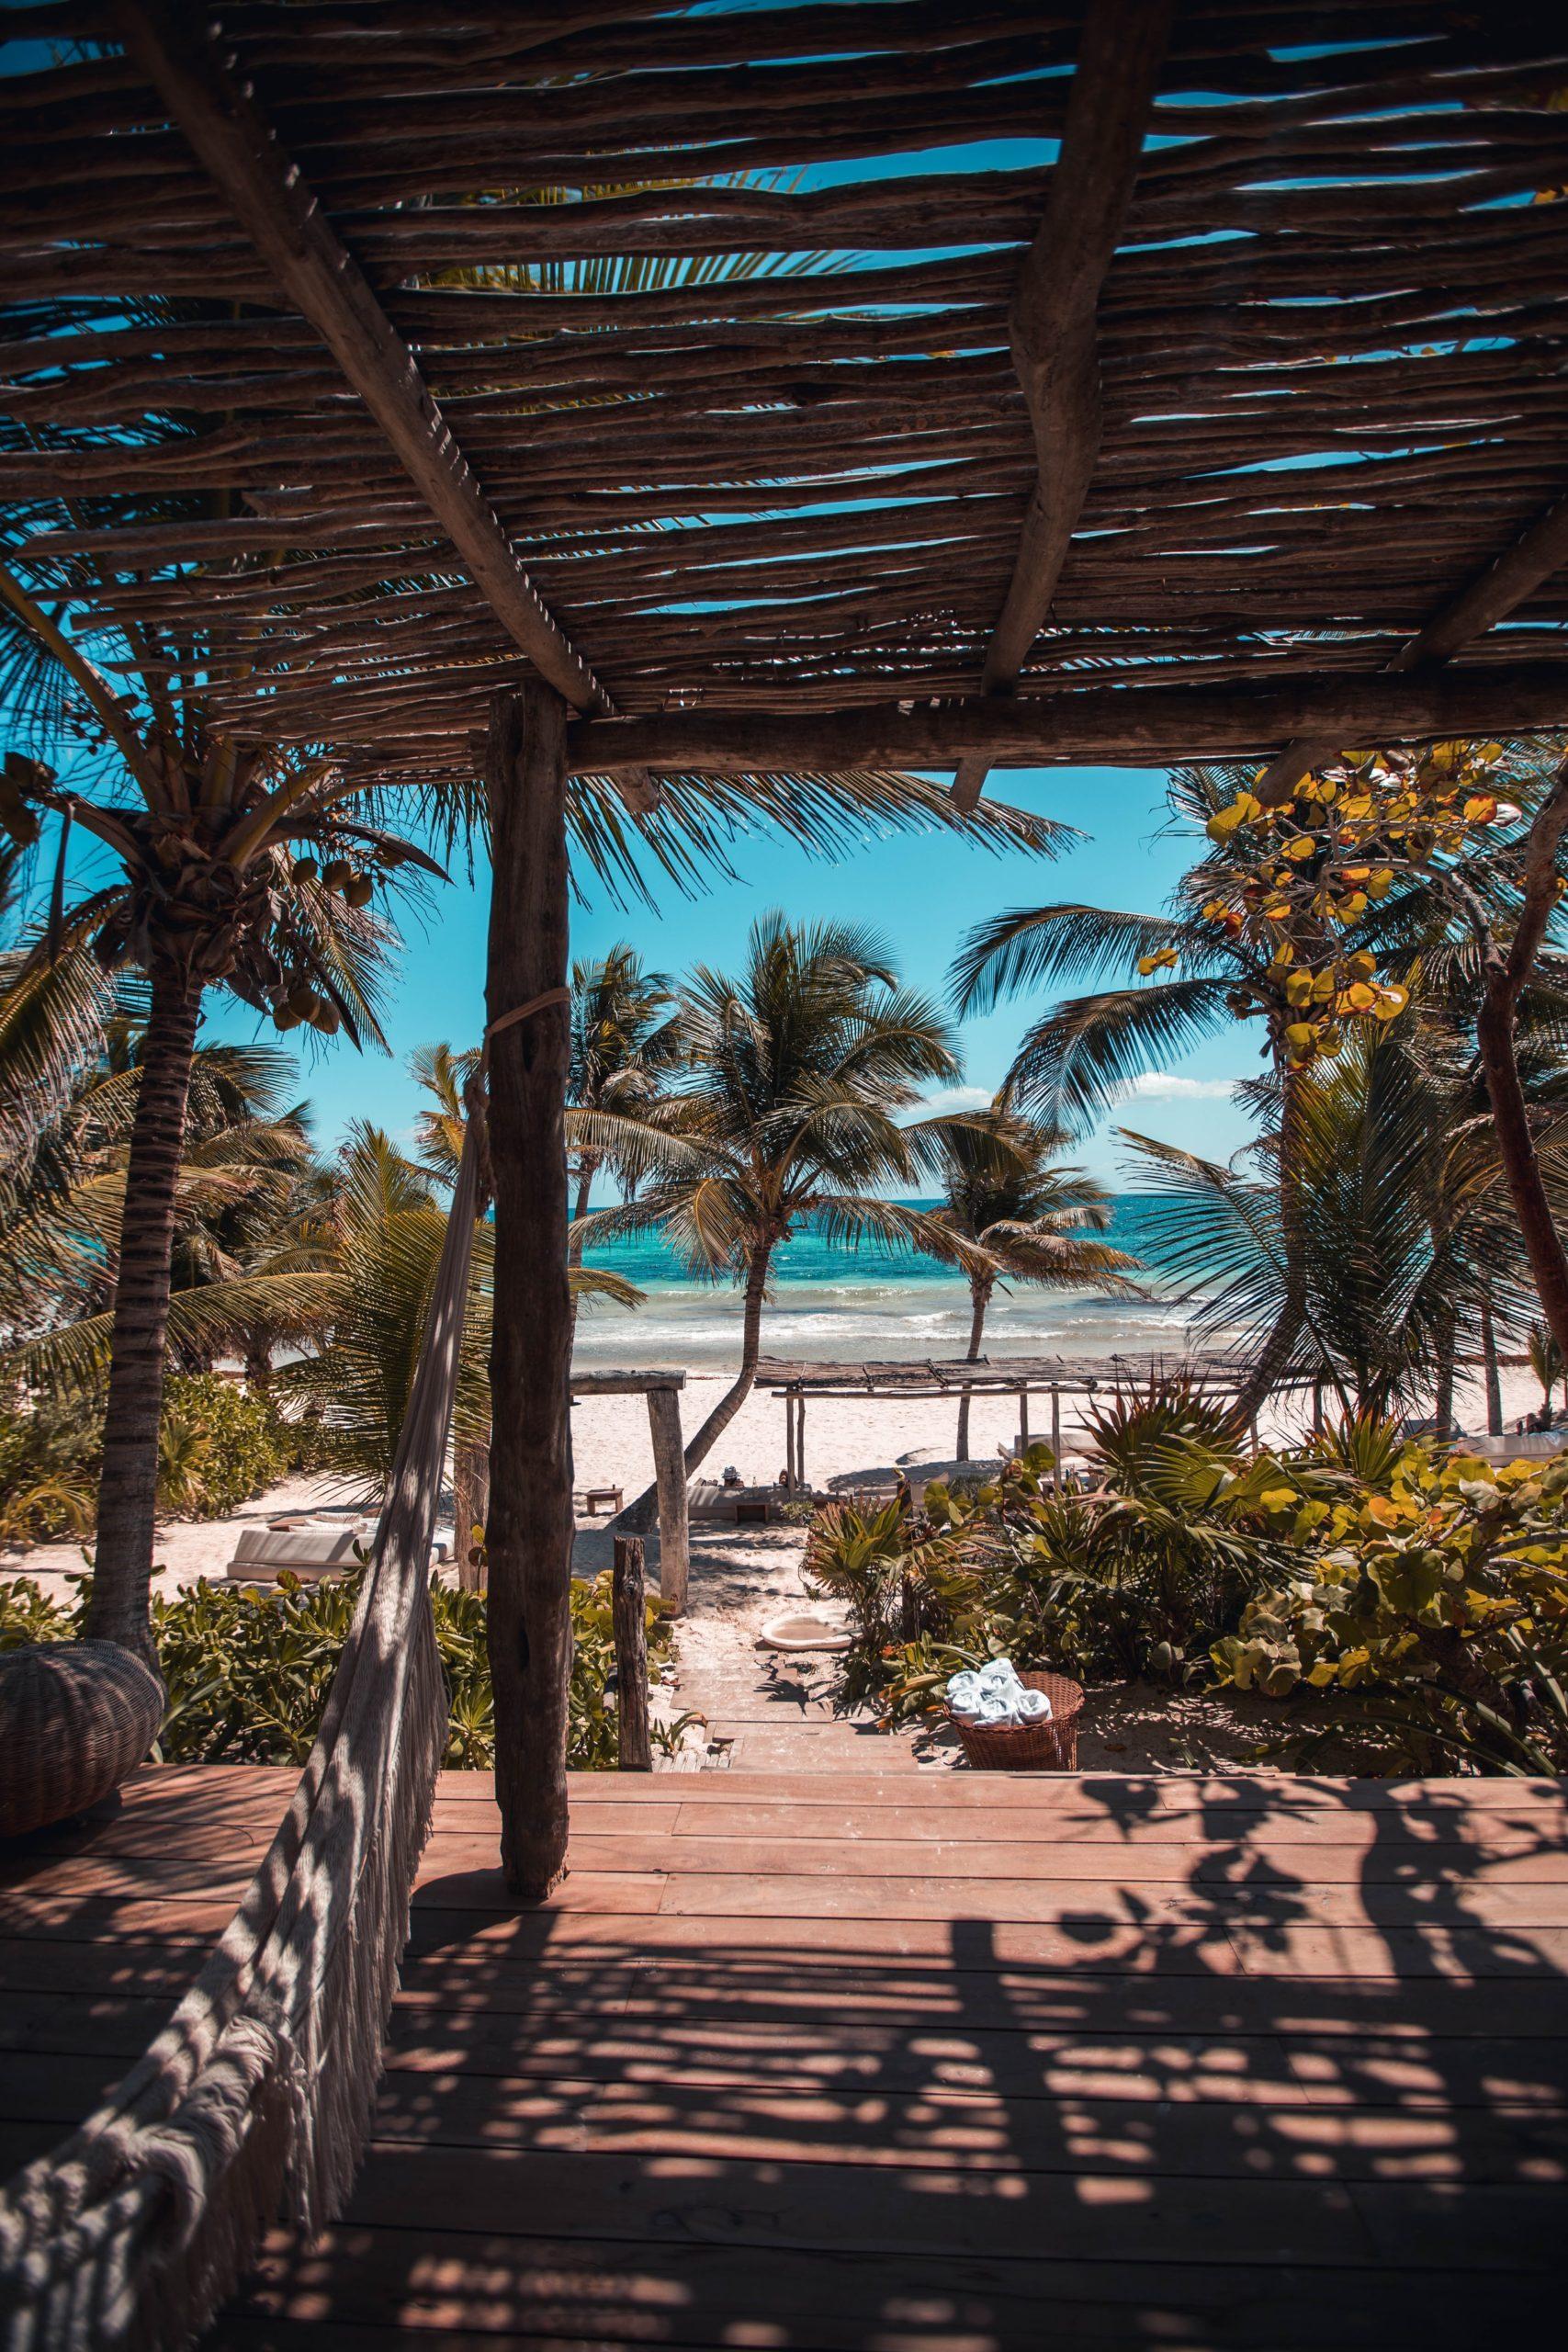 Karibikküste - Strand